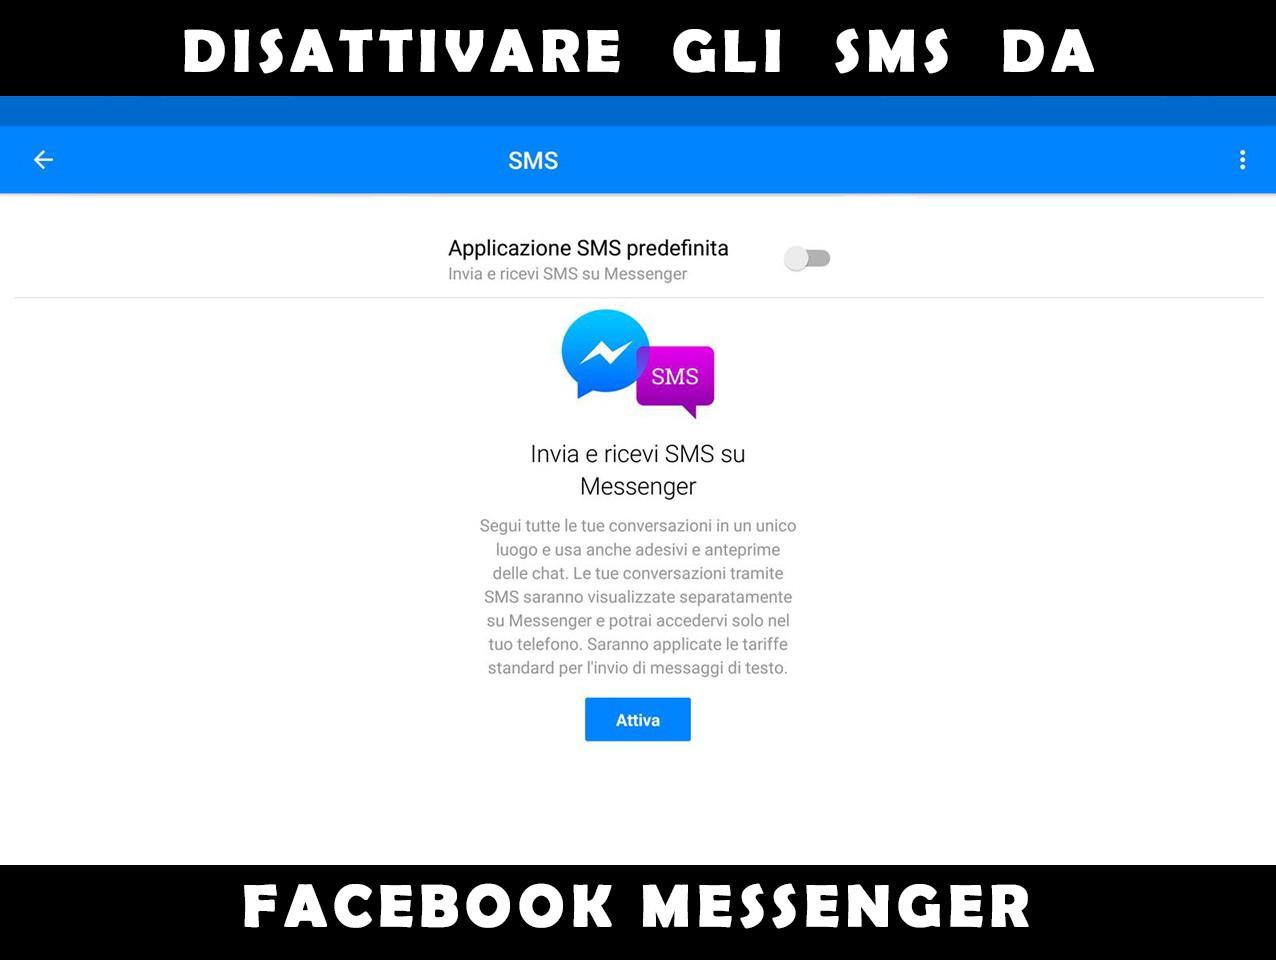 DISATTIVARE-SMS-DA-FACEBOOK-MESSENGER